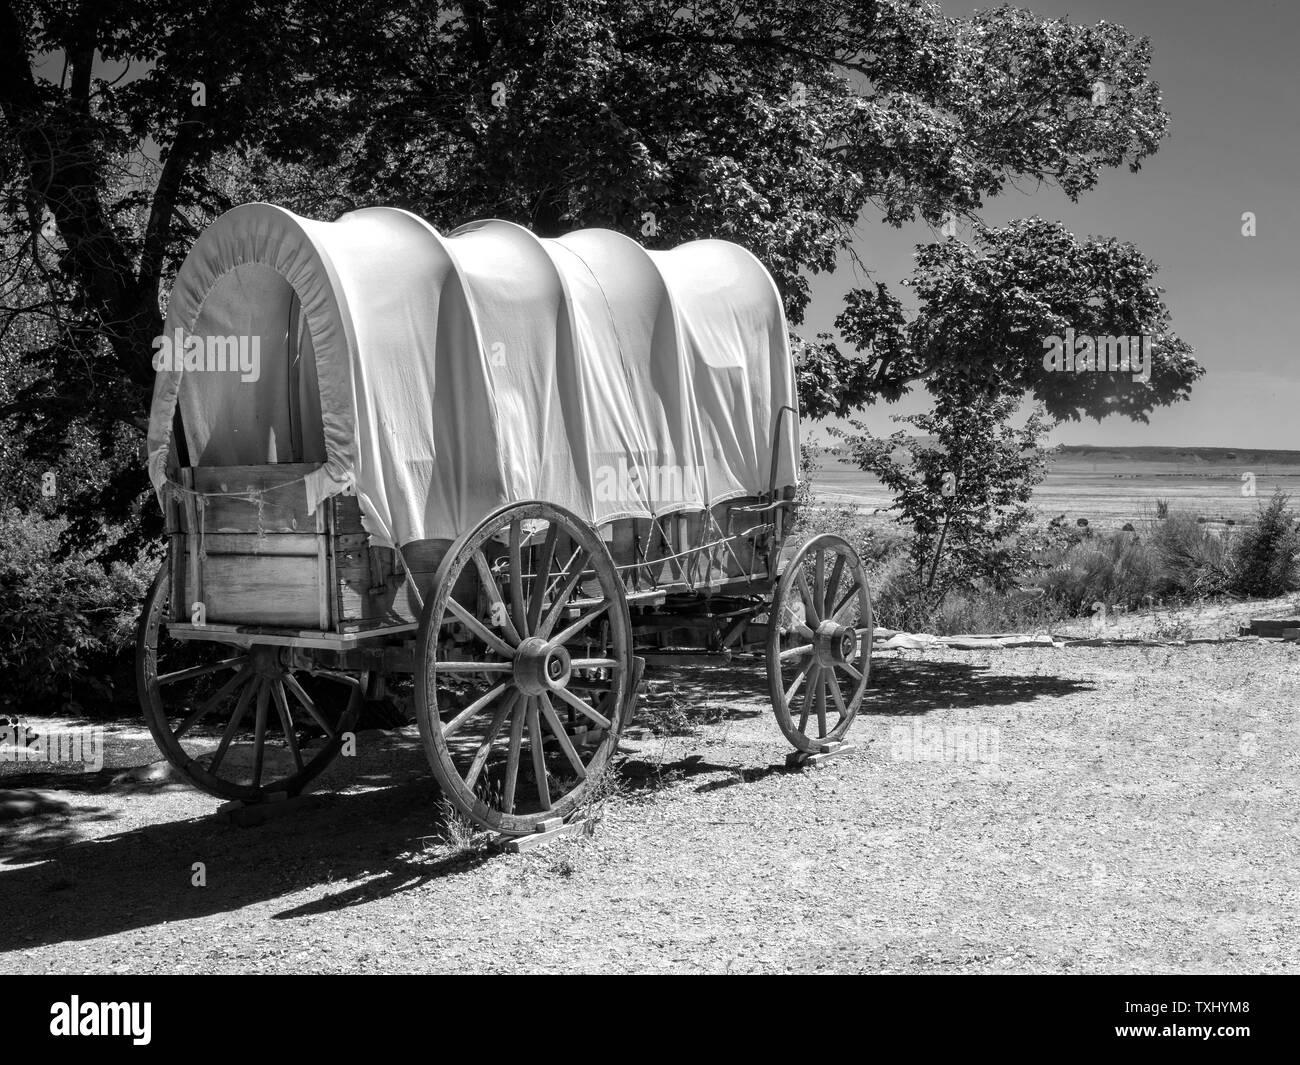 Chuck Wagon Stock Illustrations – 39 Chuck Wagon Stock Illustrations,  Vectors & Clipart - Dreamstime